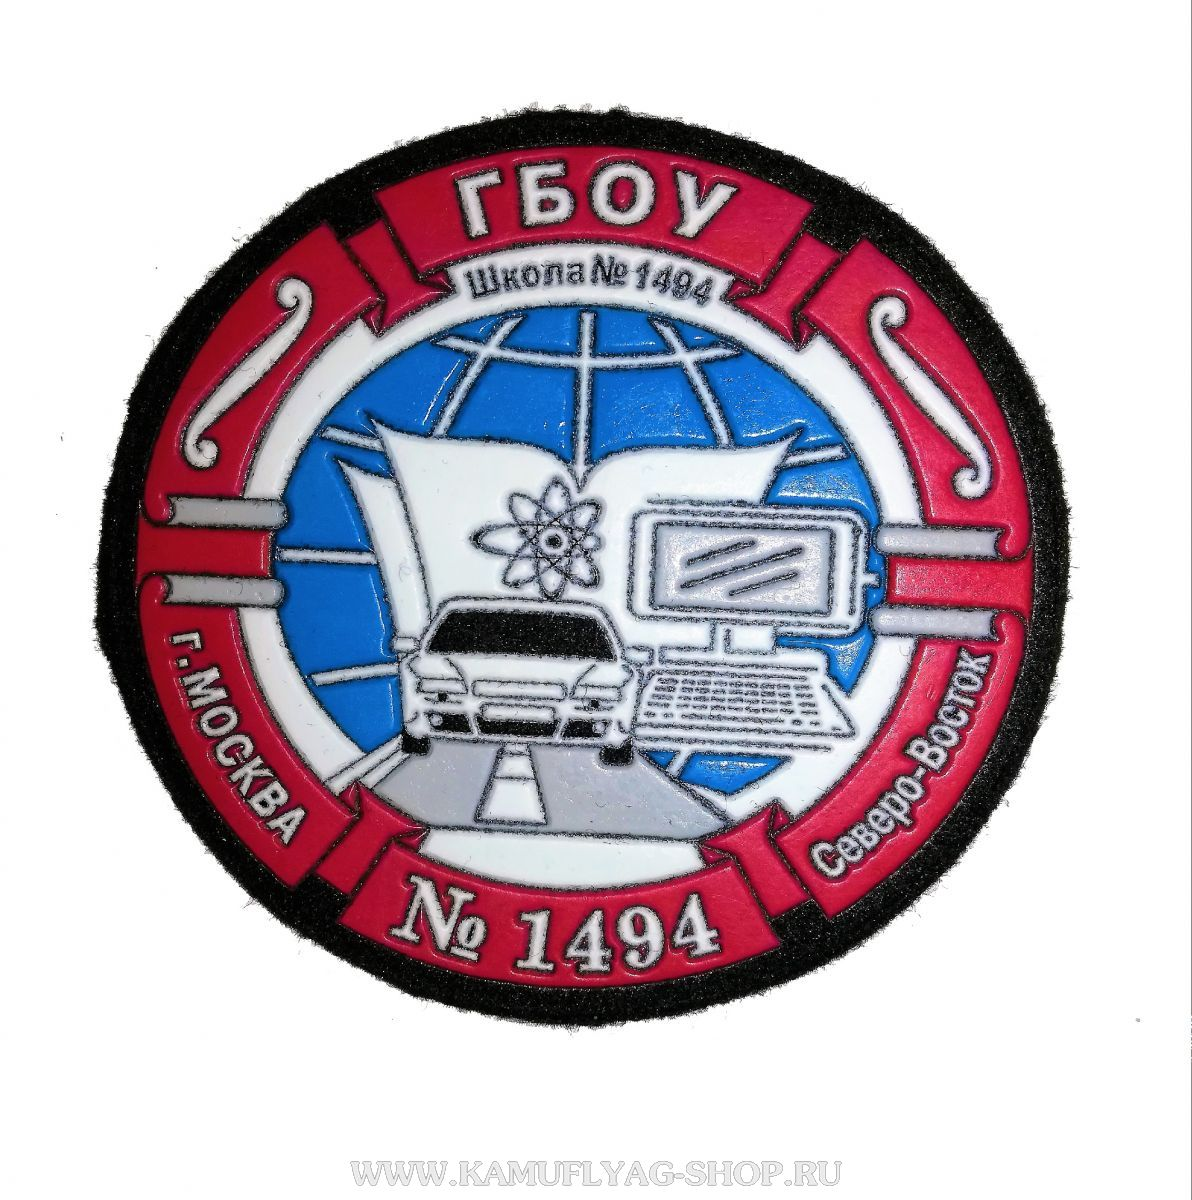 Шеврон фирменный ГБОУ школа № 1494, пластизоль